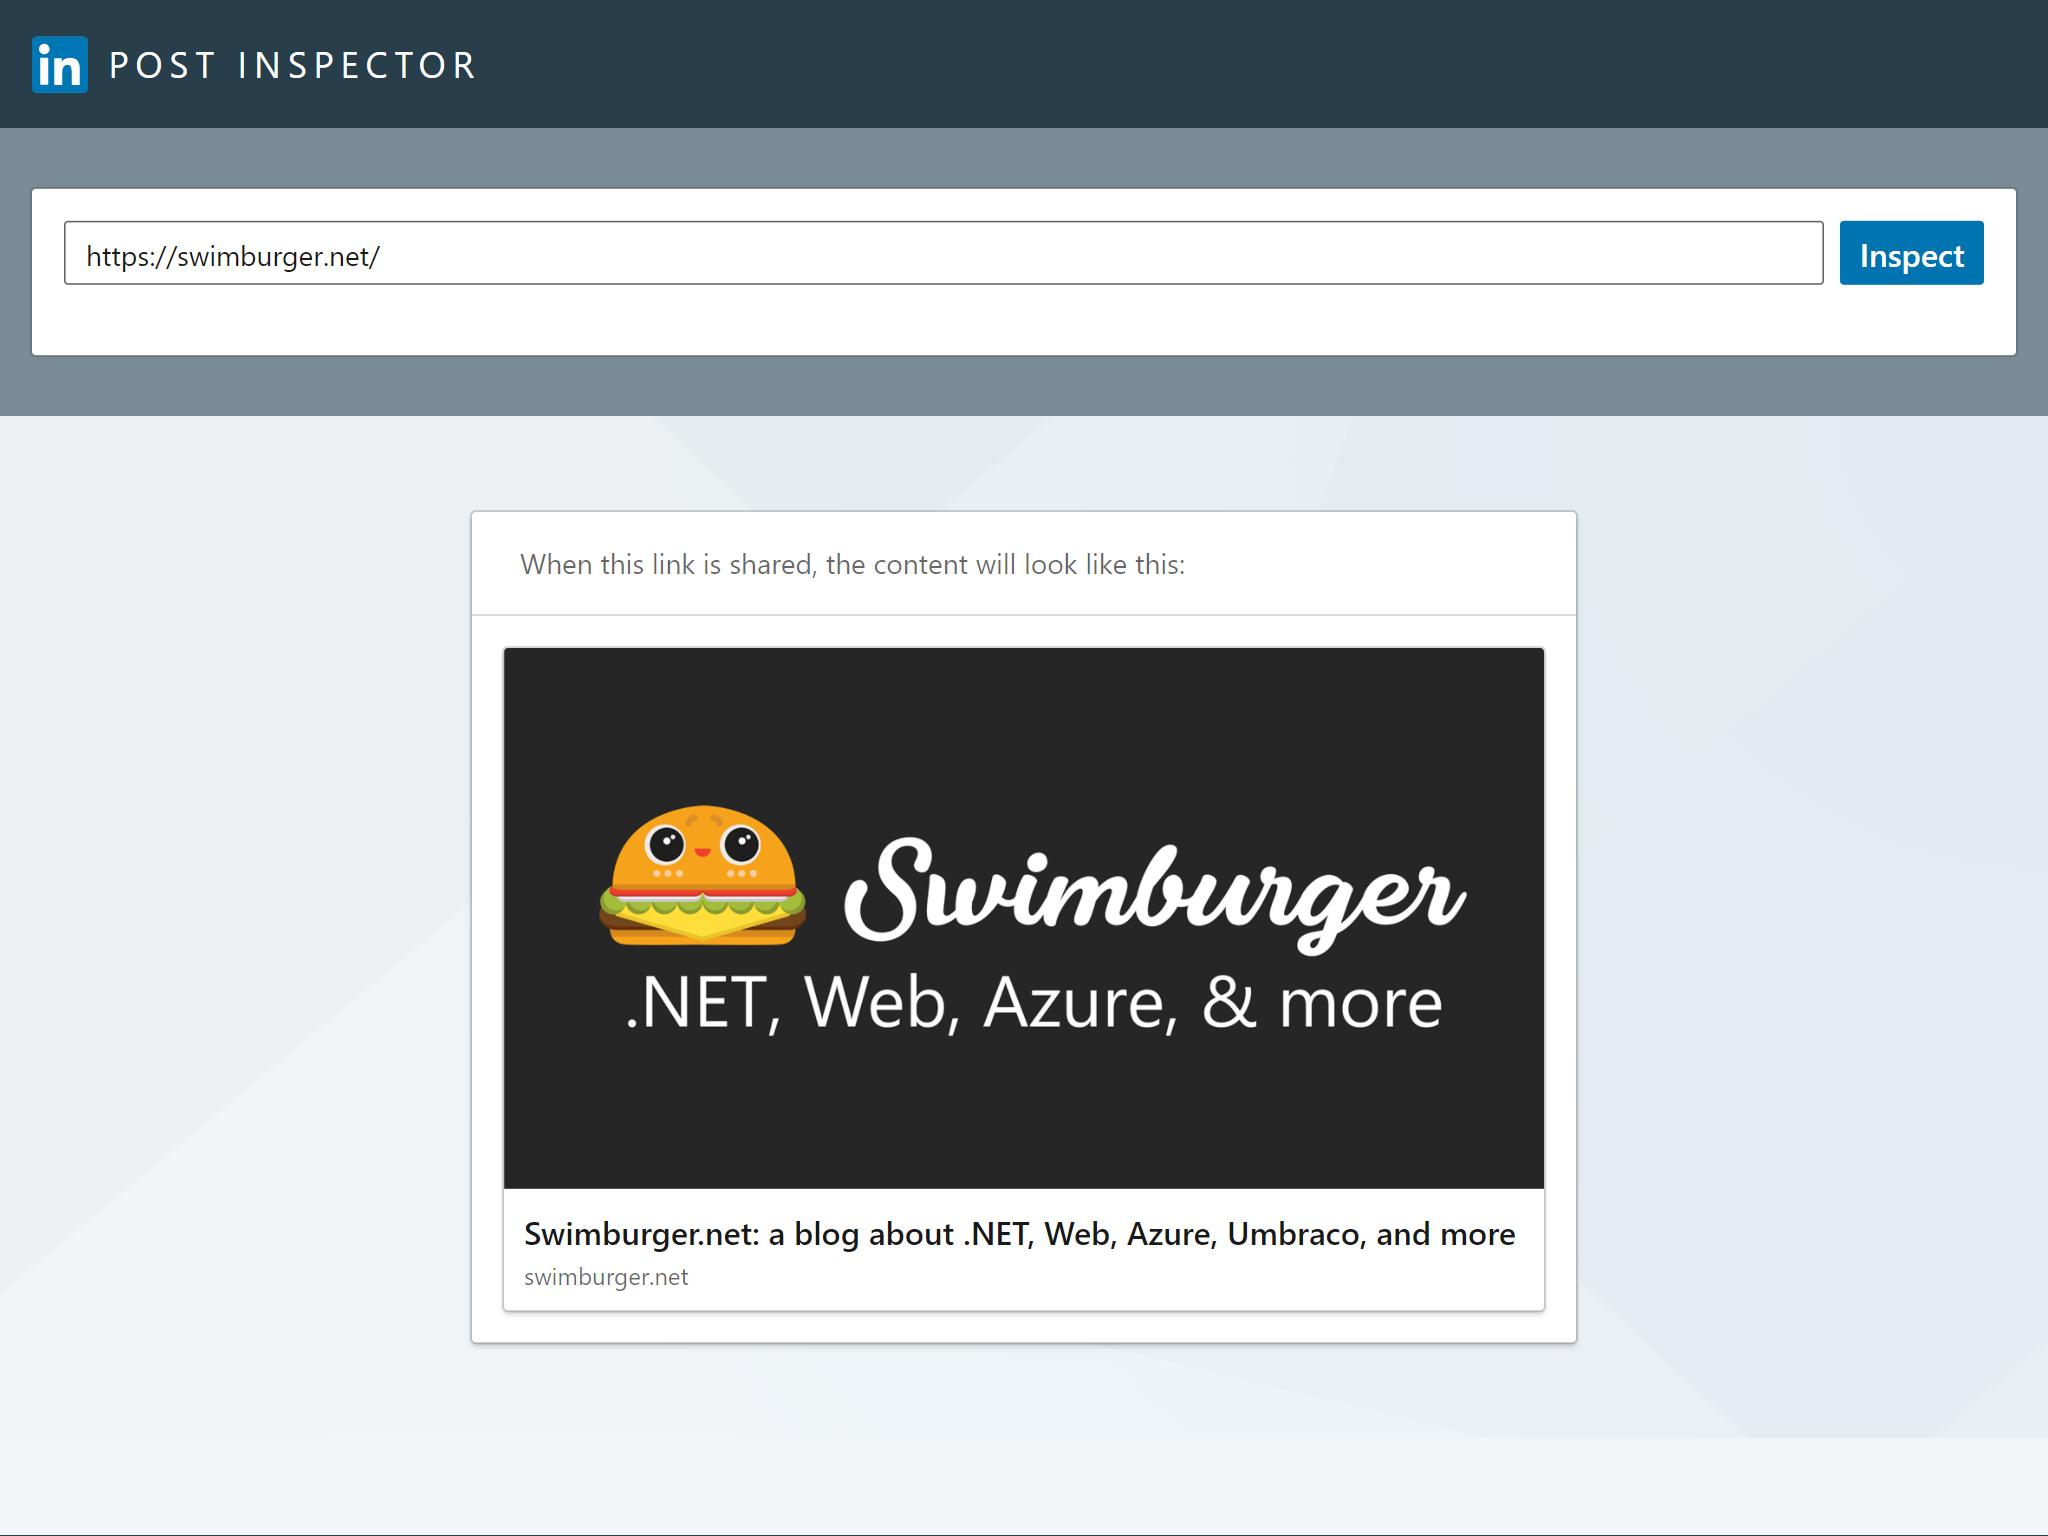 Screenshot of LinkedIn Post Inspector for swimburger.net